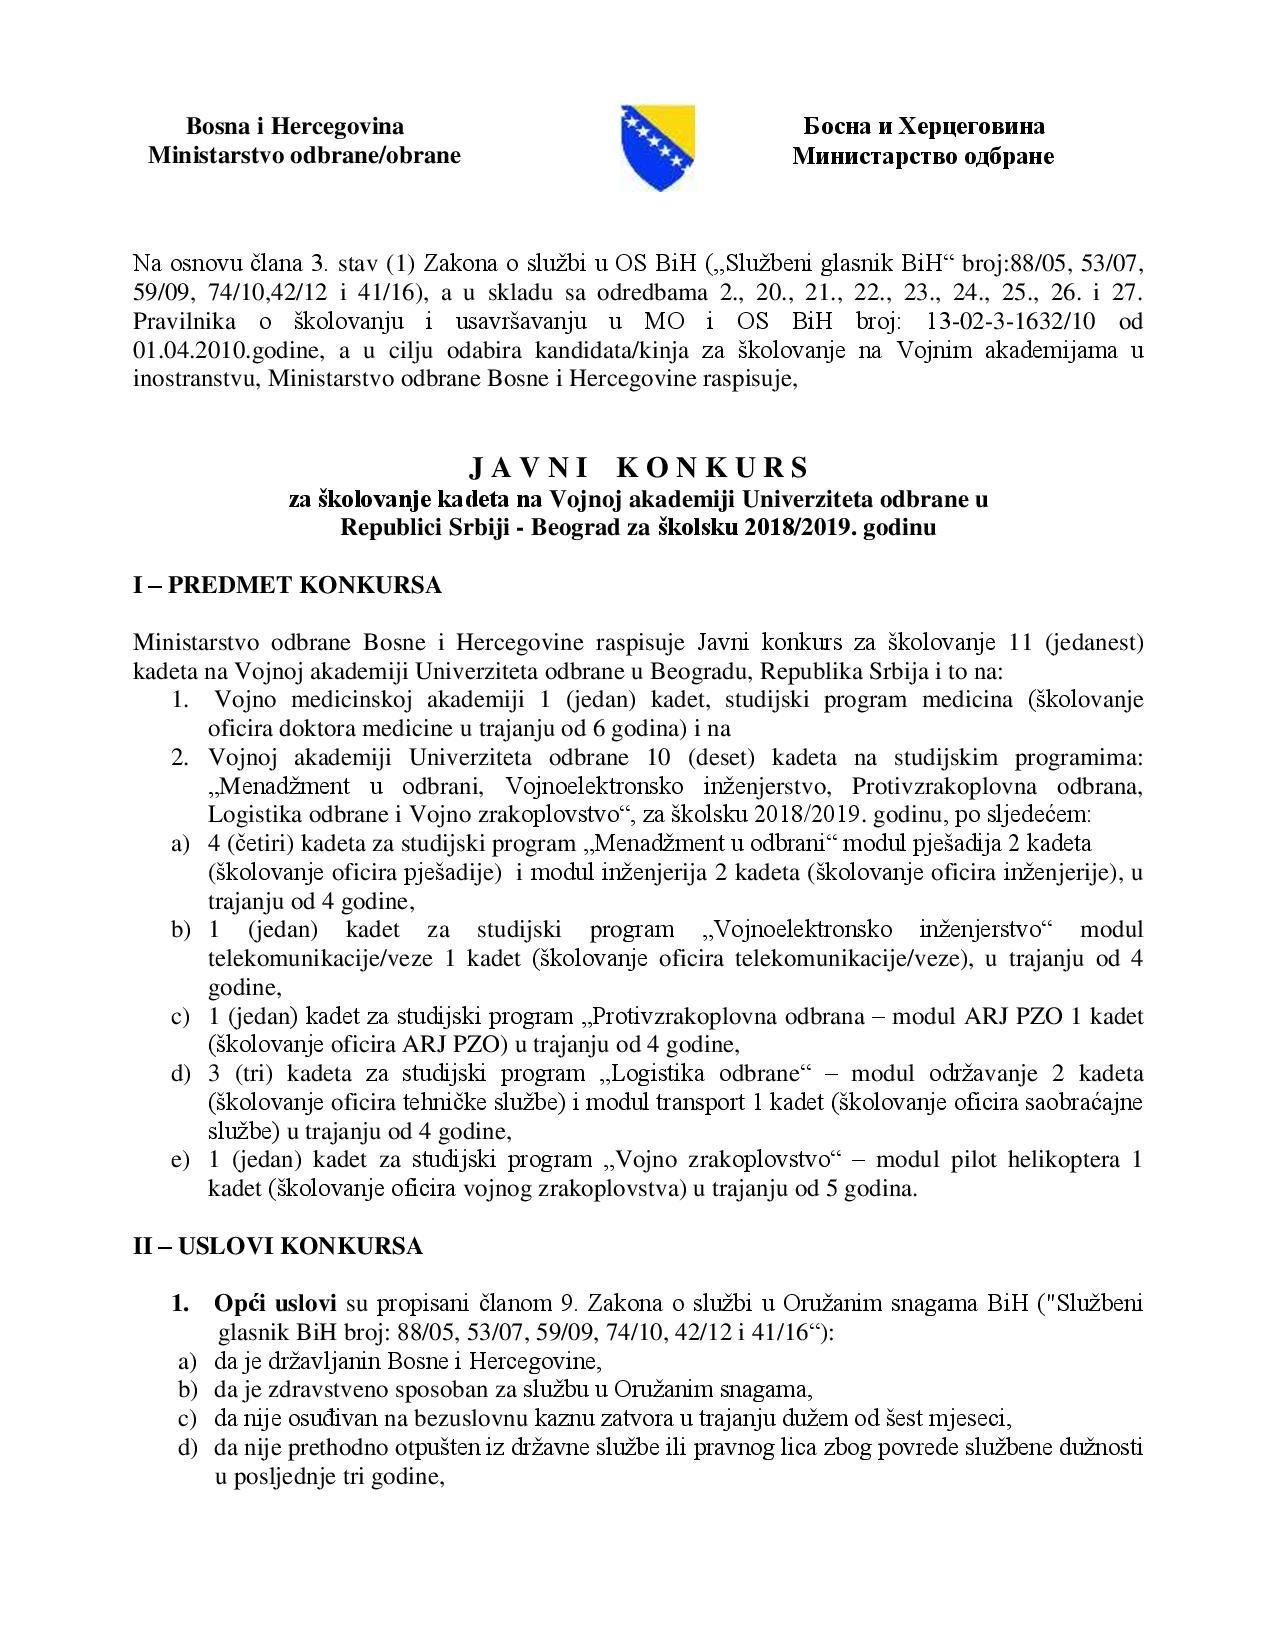 JAVNI KONKURS-page-001